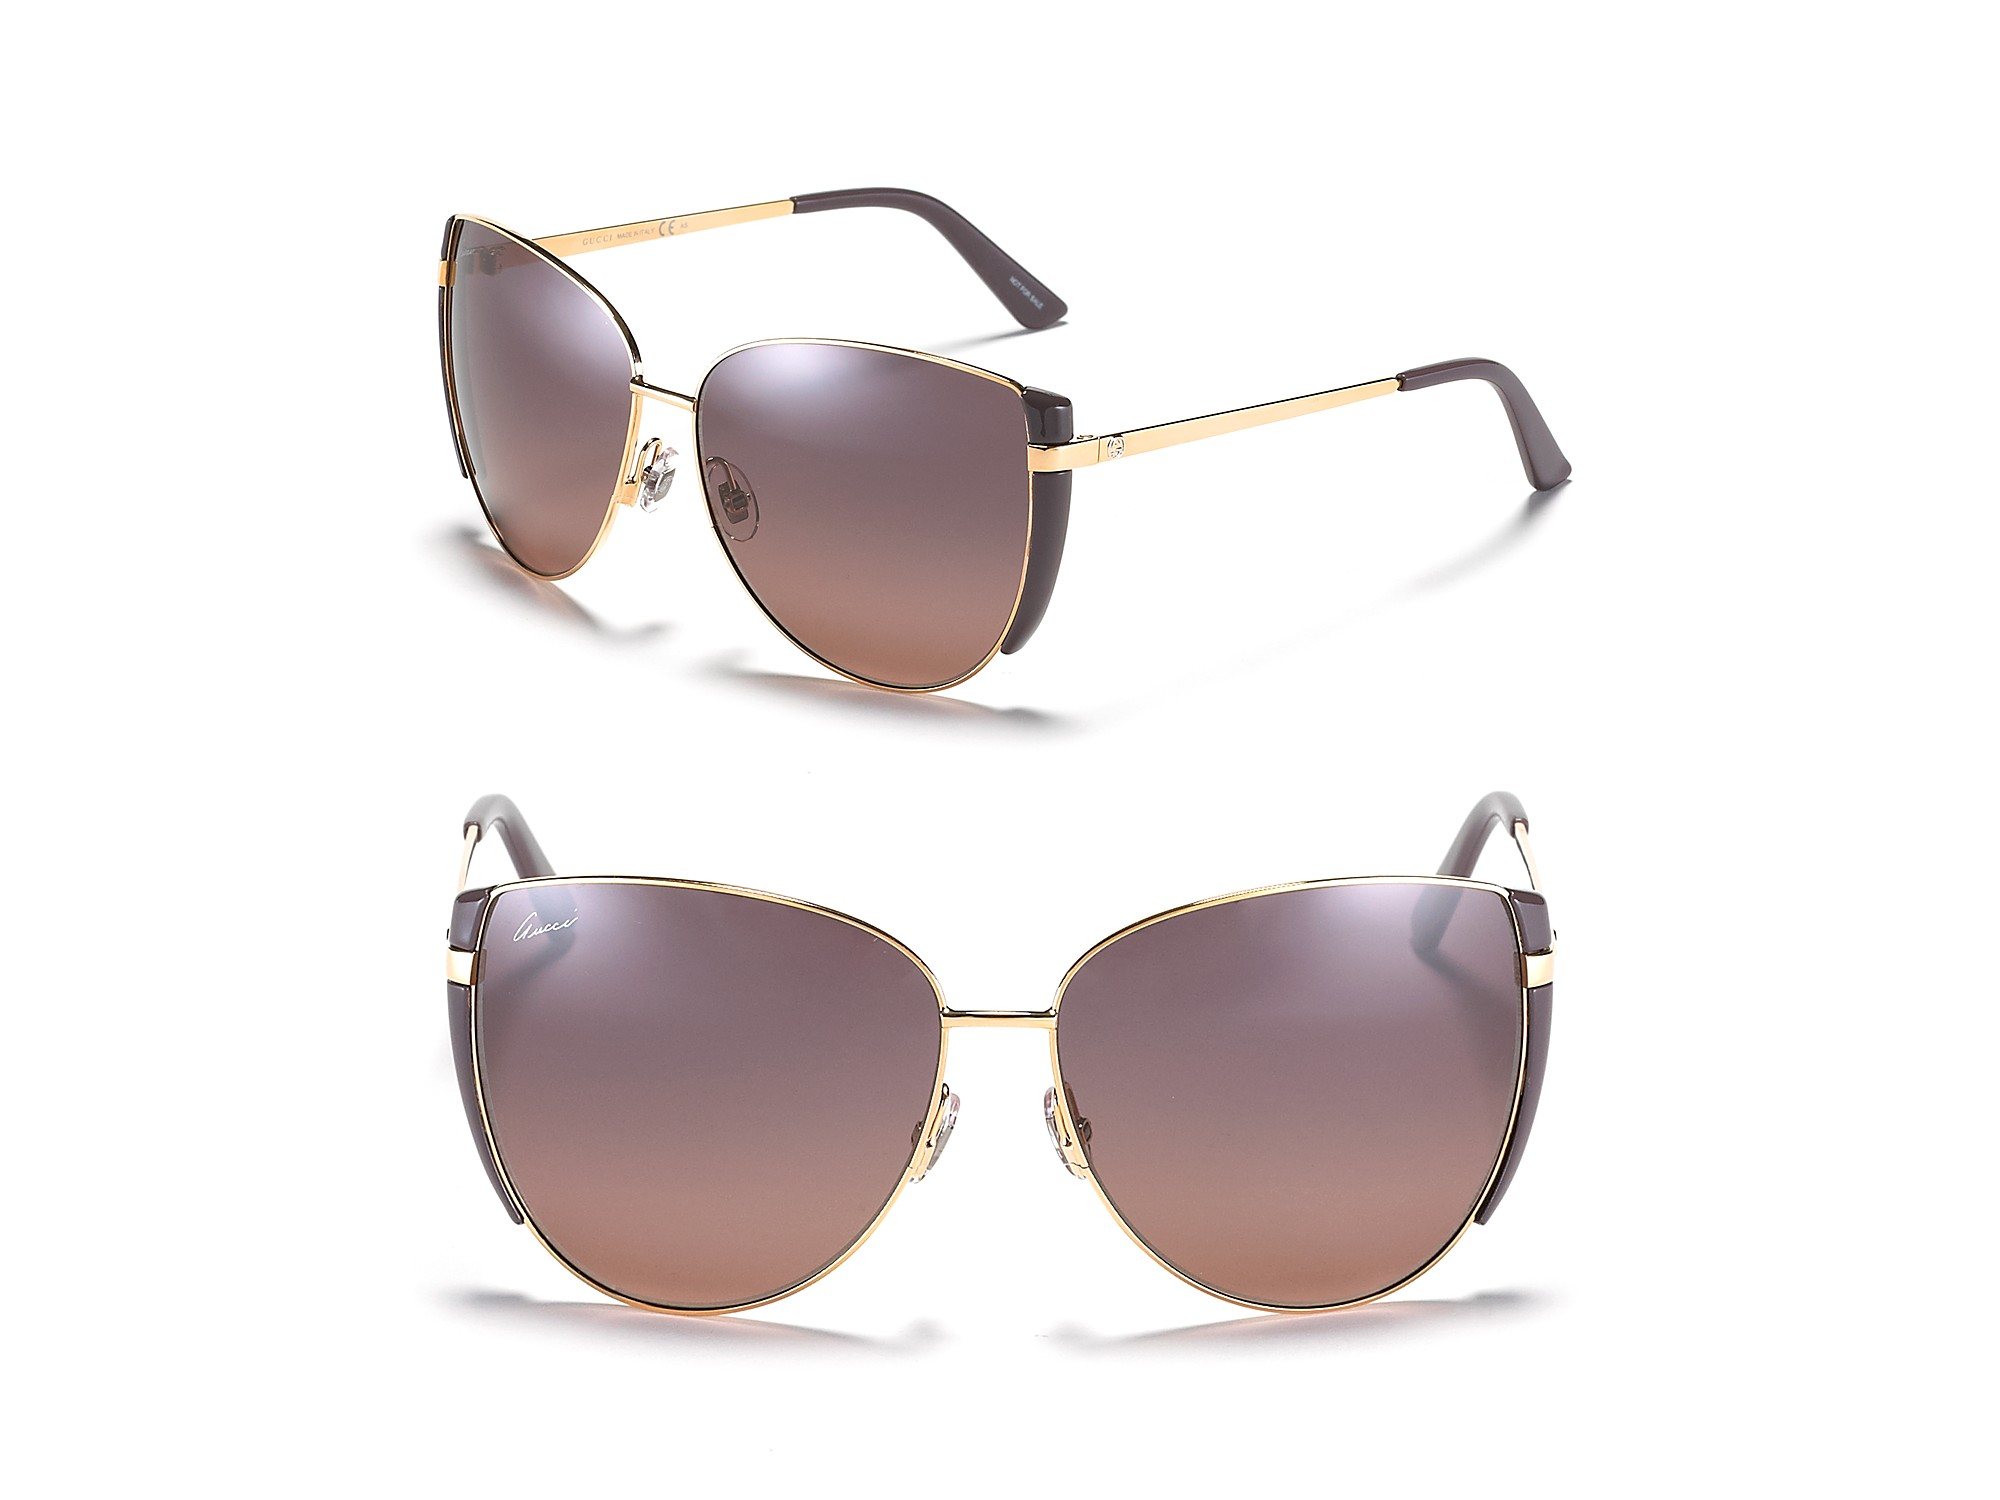 3e6451f46fe Lyst - Gucci Round Oversized Aviator Sunglasses with Purple Trim in ...